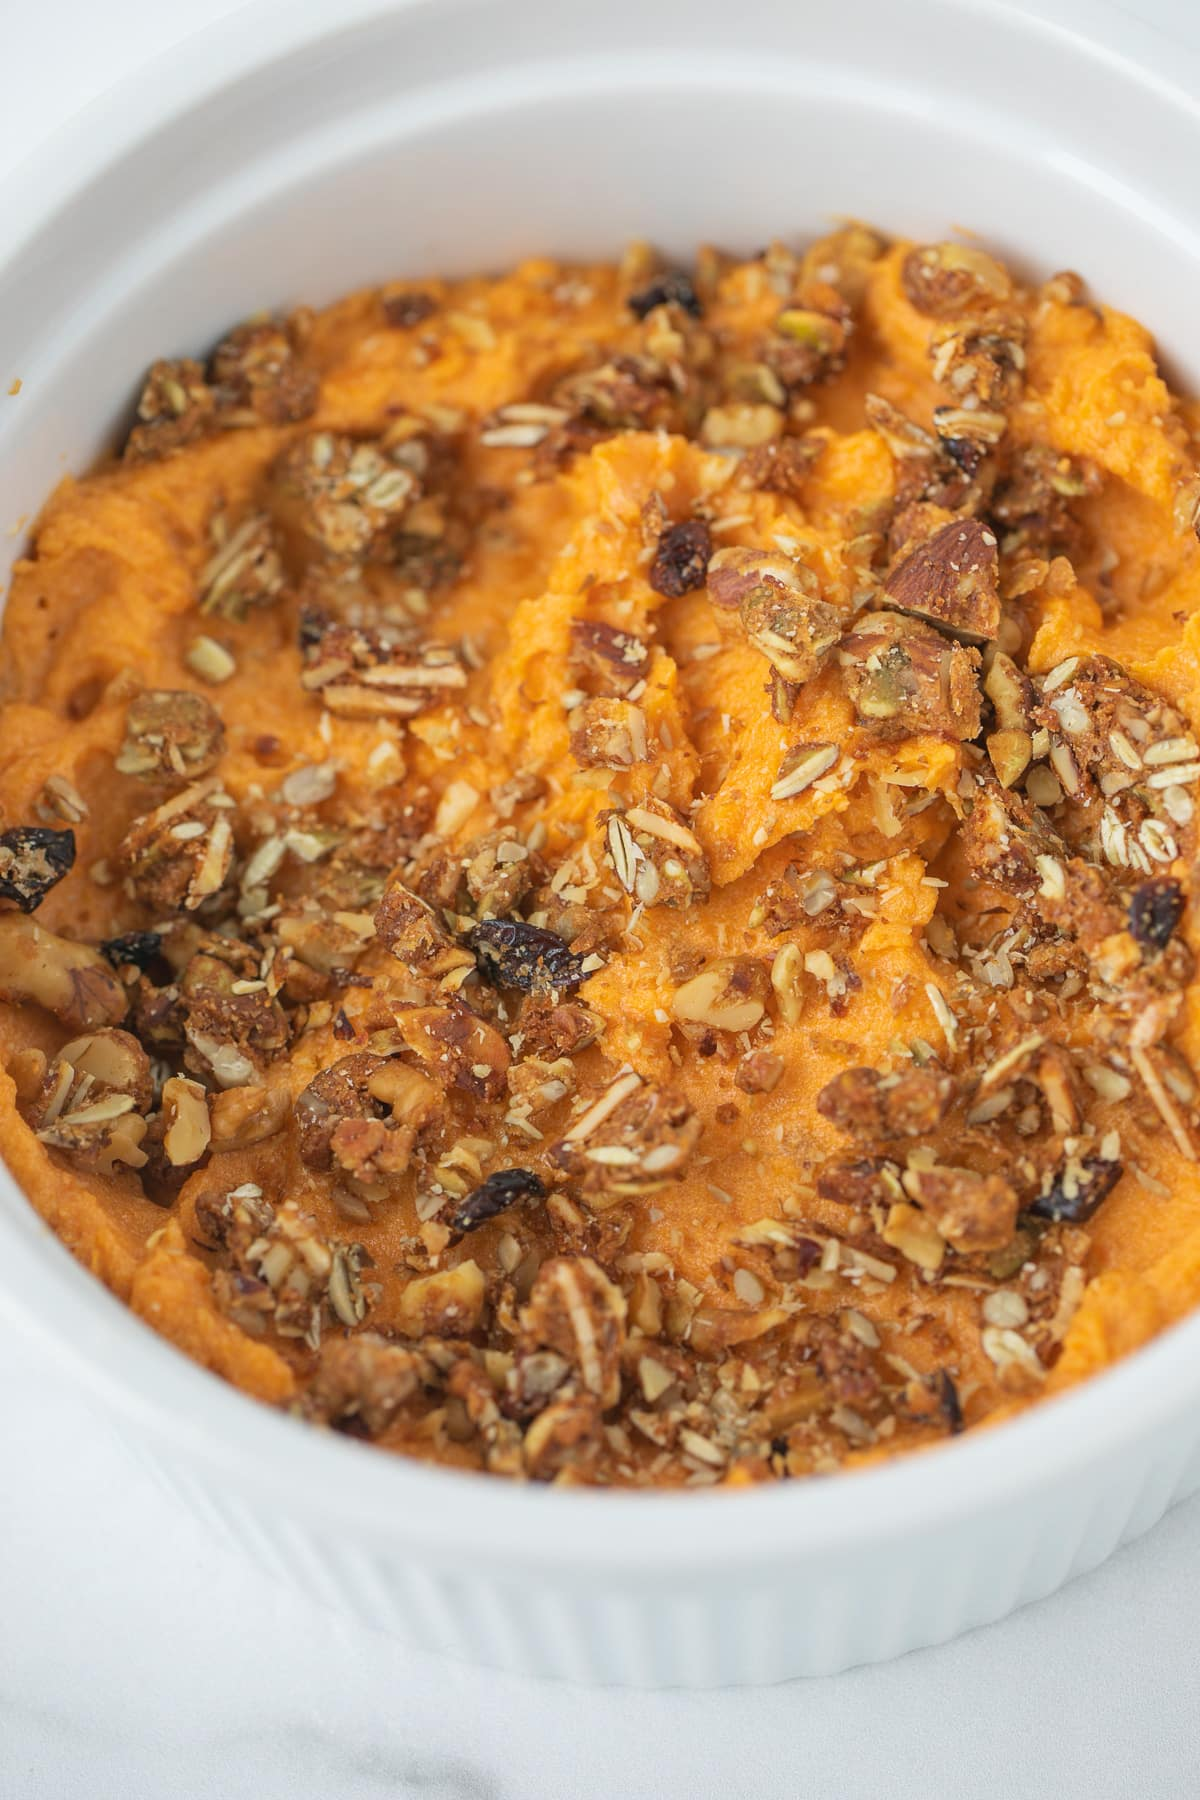 sweet potato souffle topped with gluten free granola